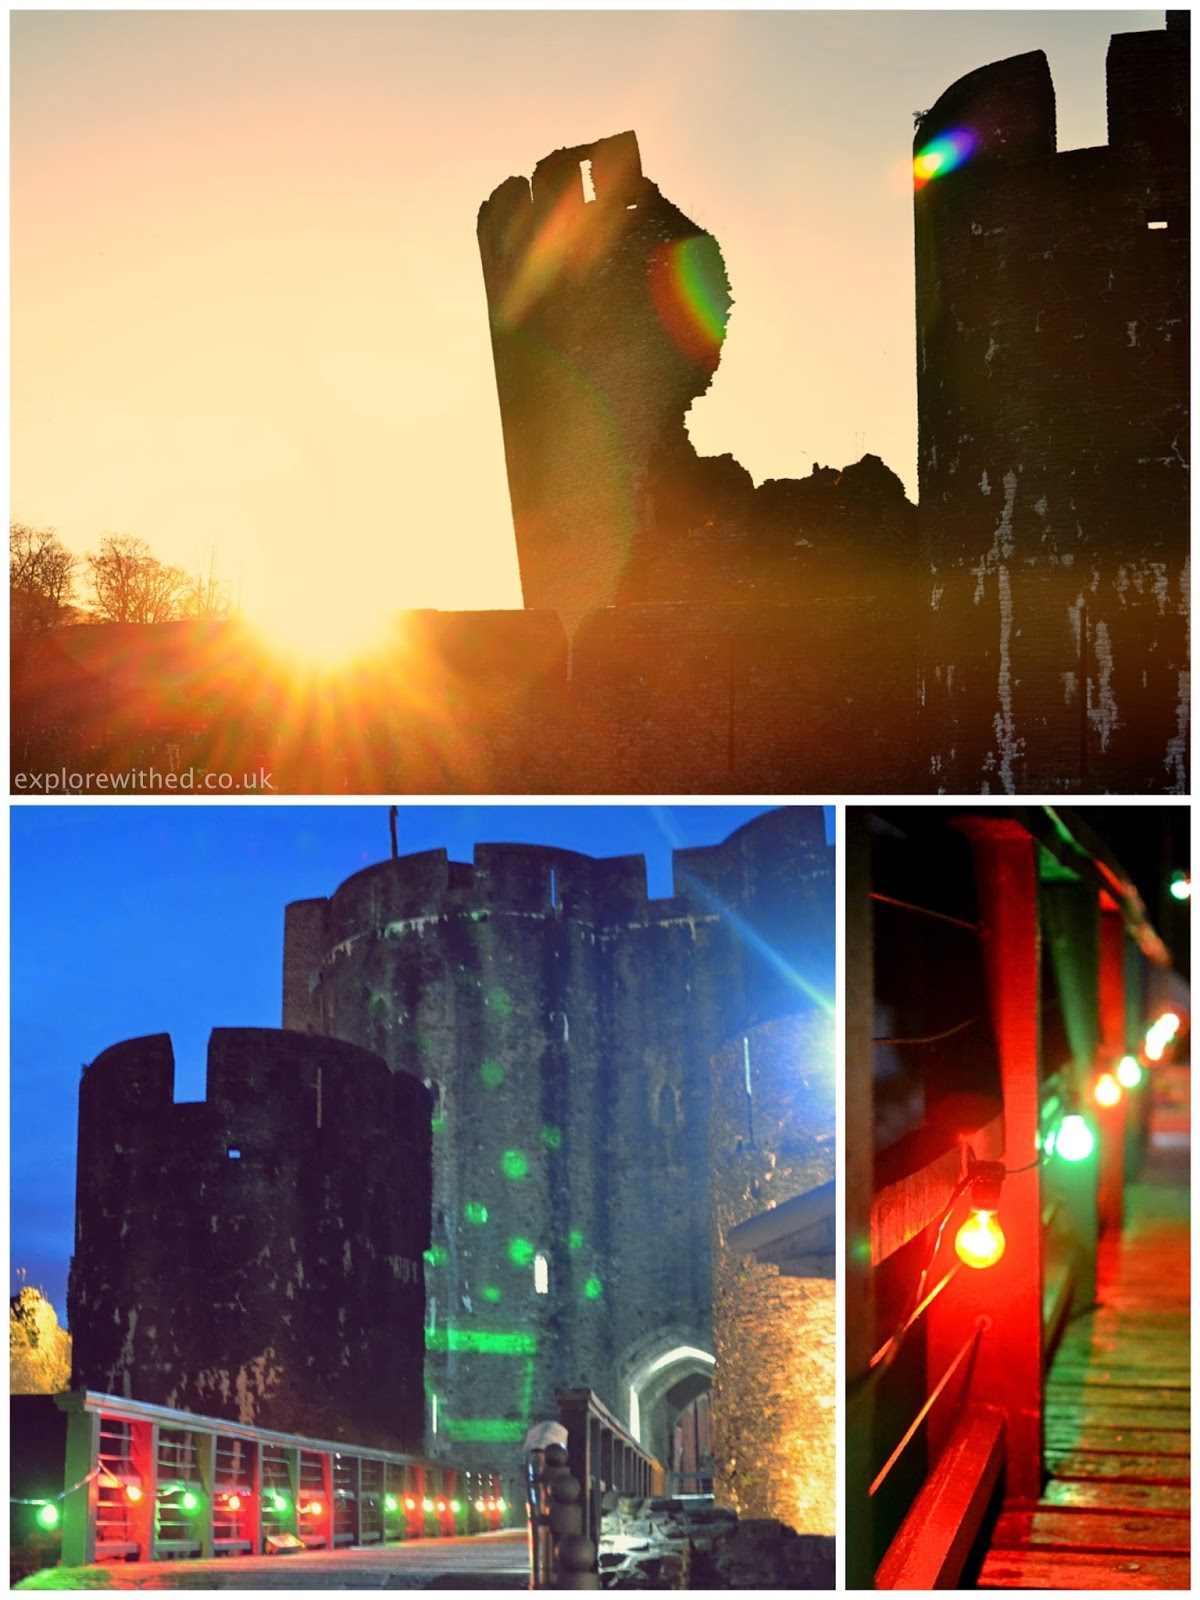 Sunset in Caerphilly